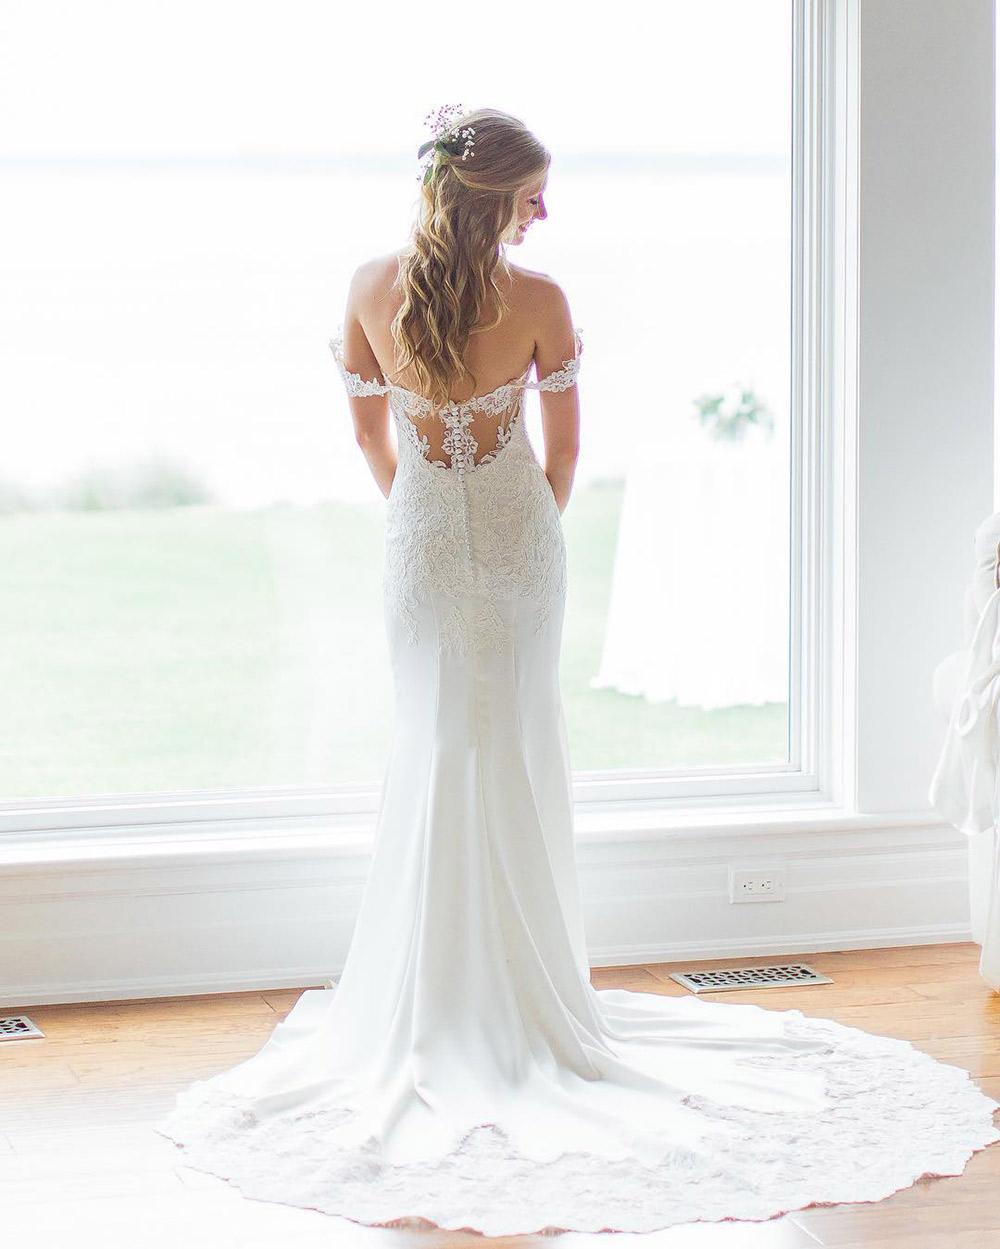 Simply-Stunning-Bridal-Makeup-Vineyard-Bride-003.jpg